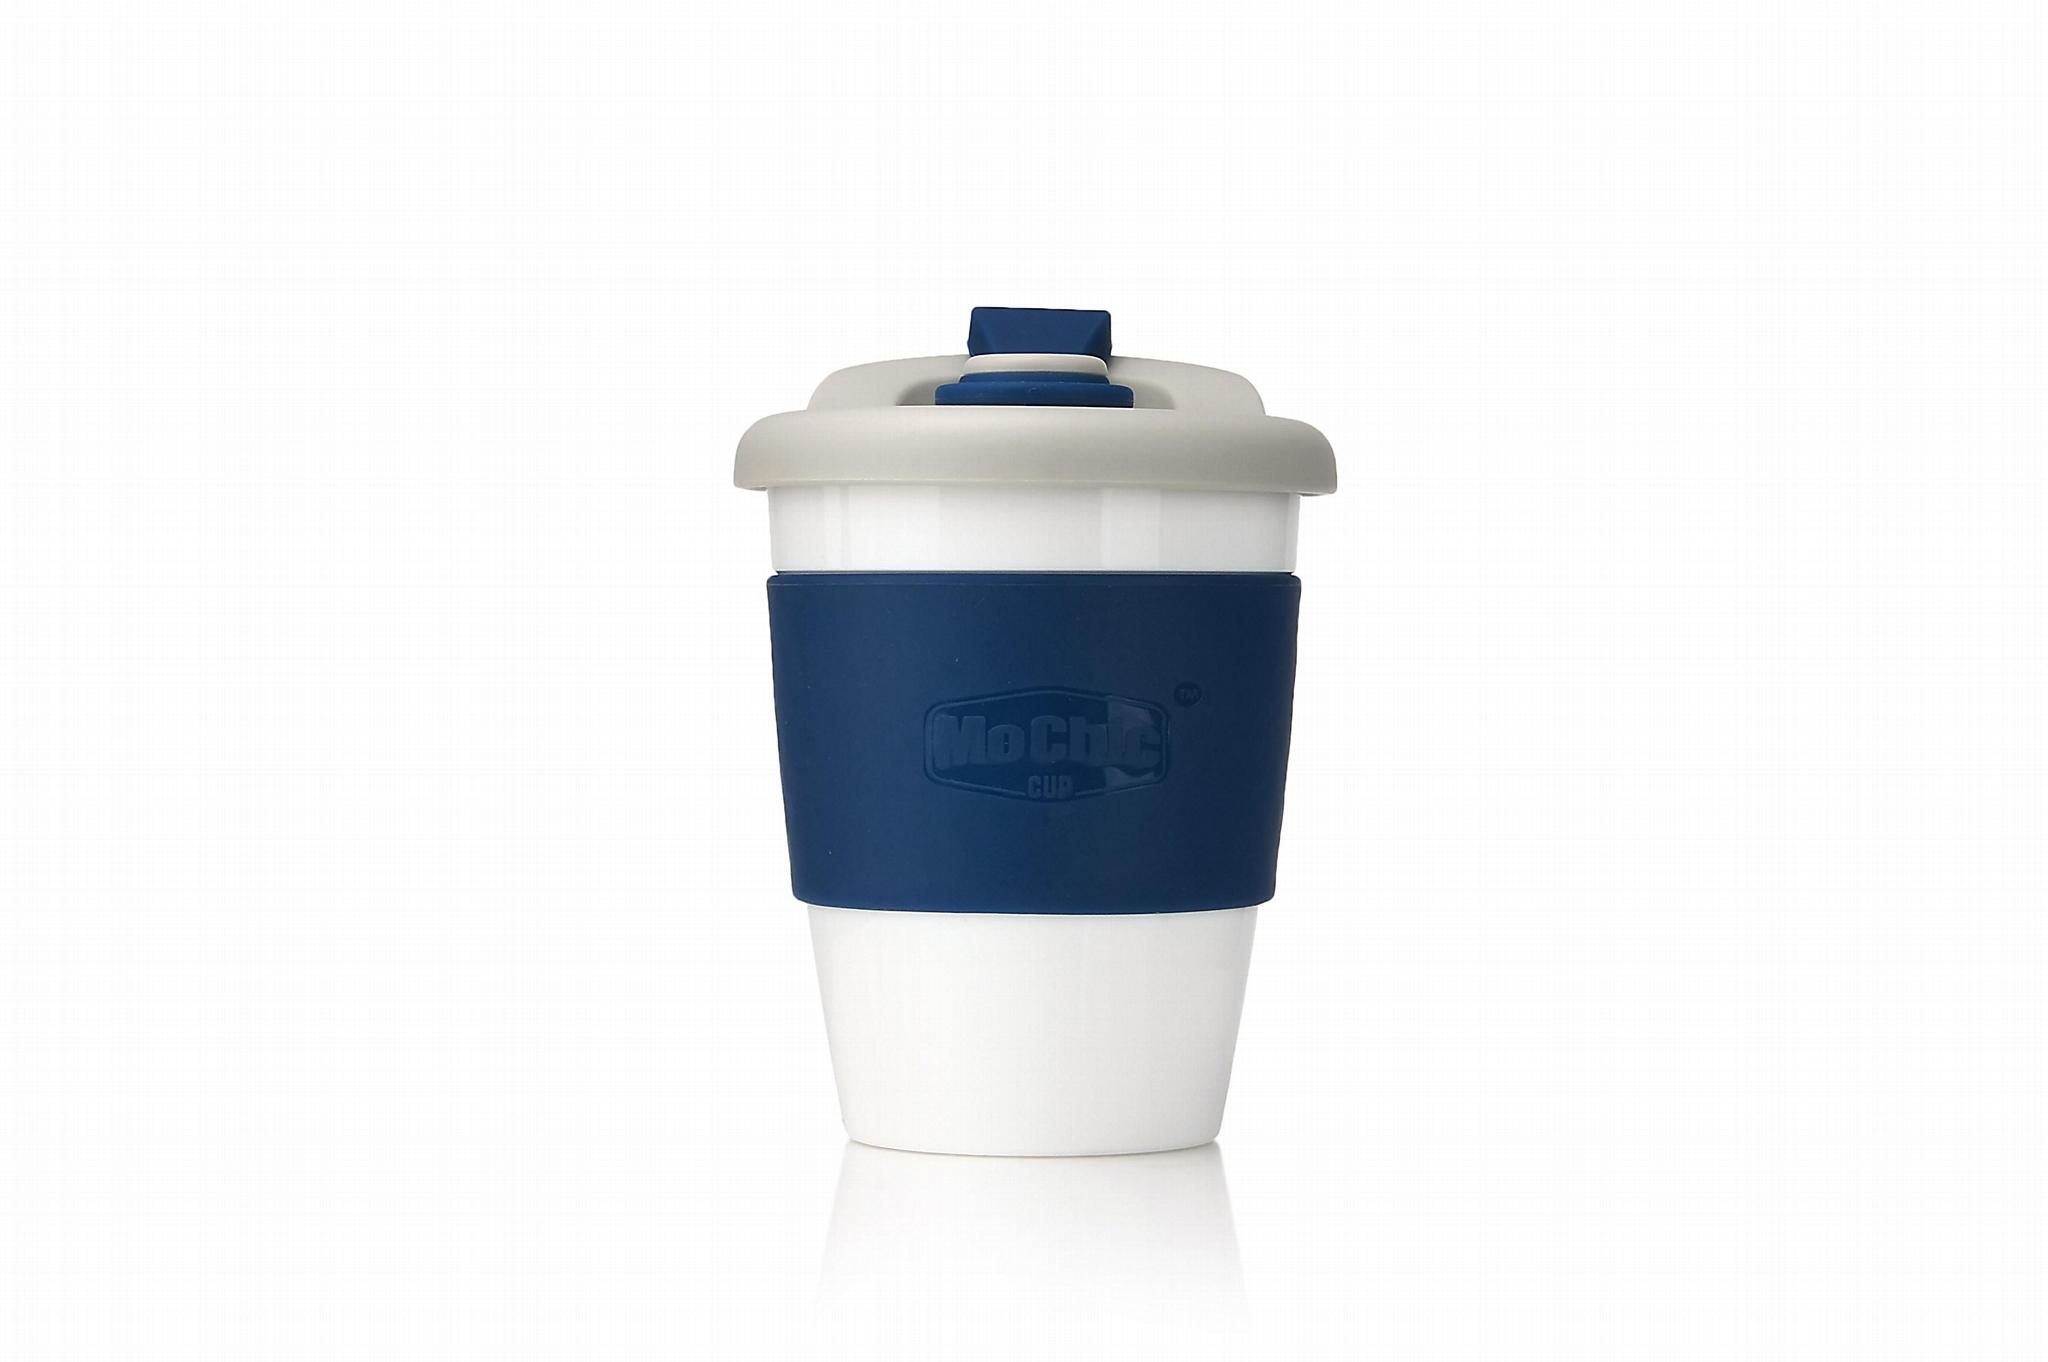 MoChic pla咖啡杯定制 1